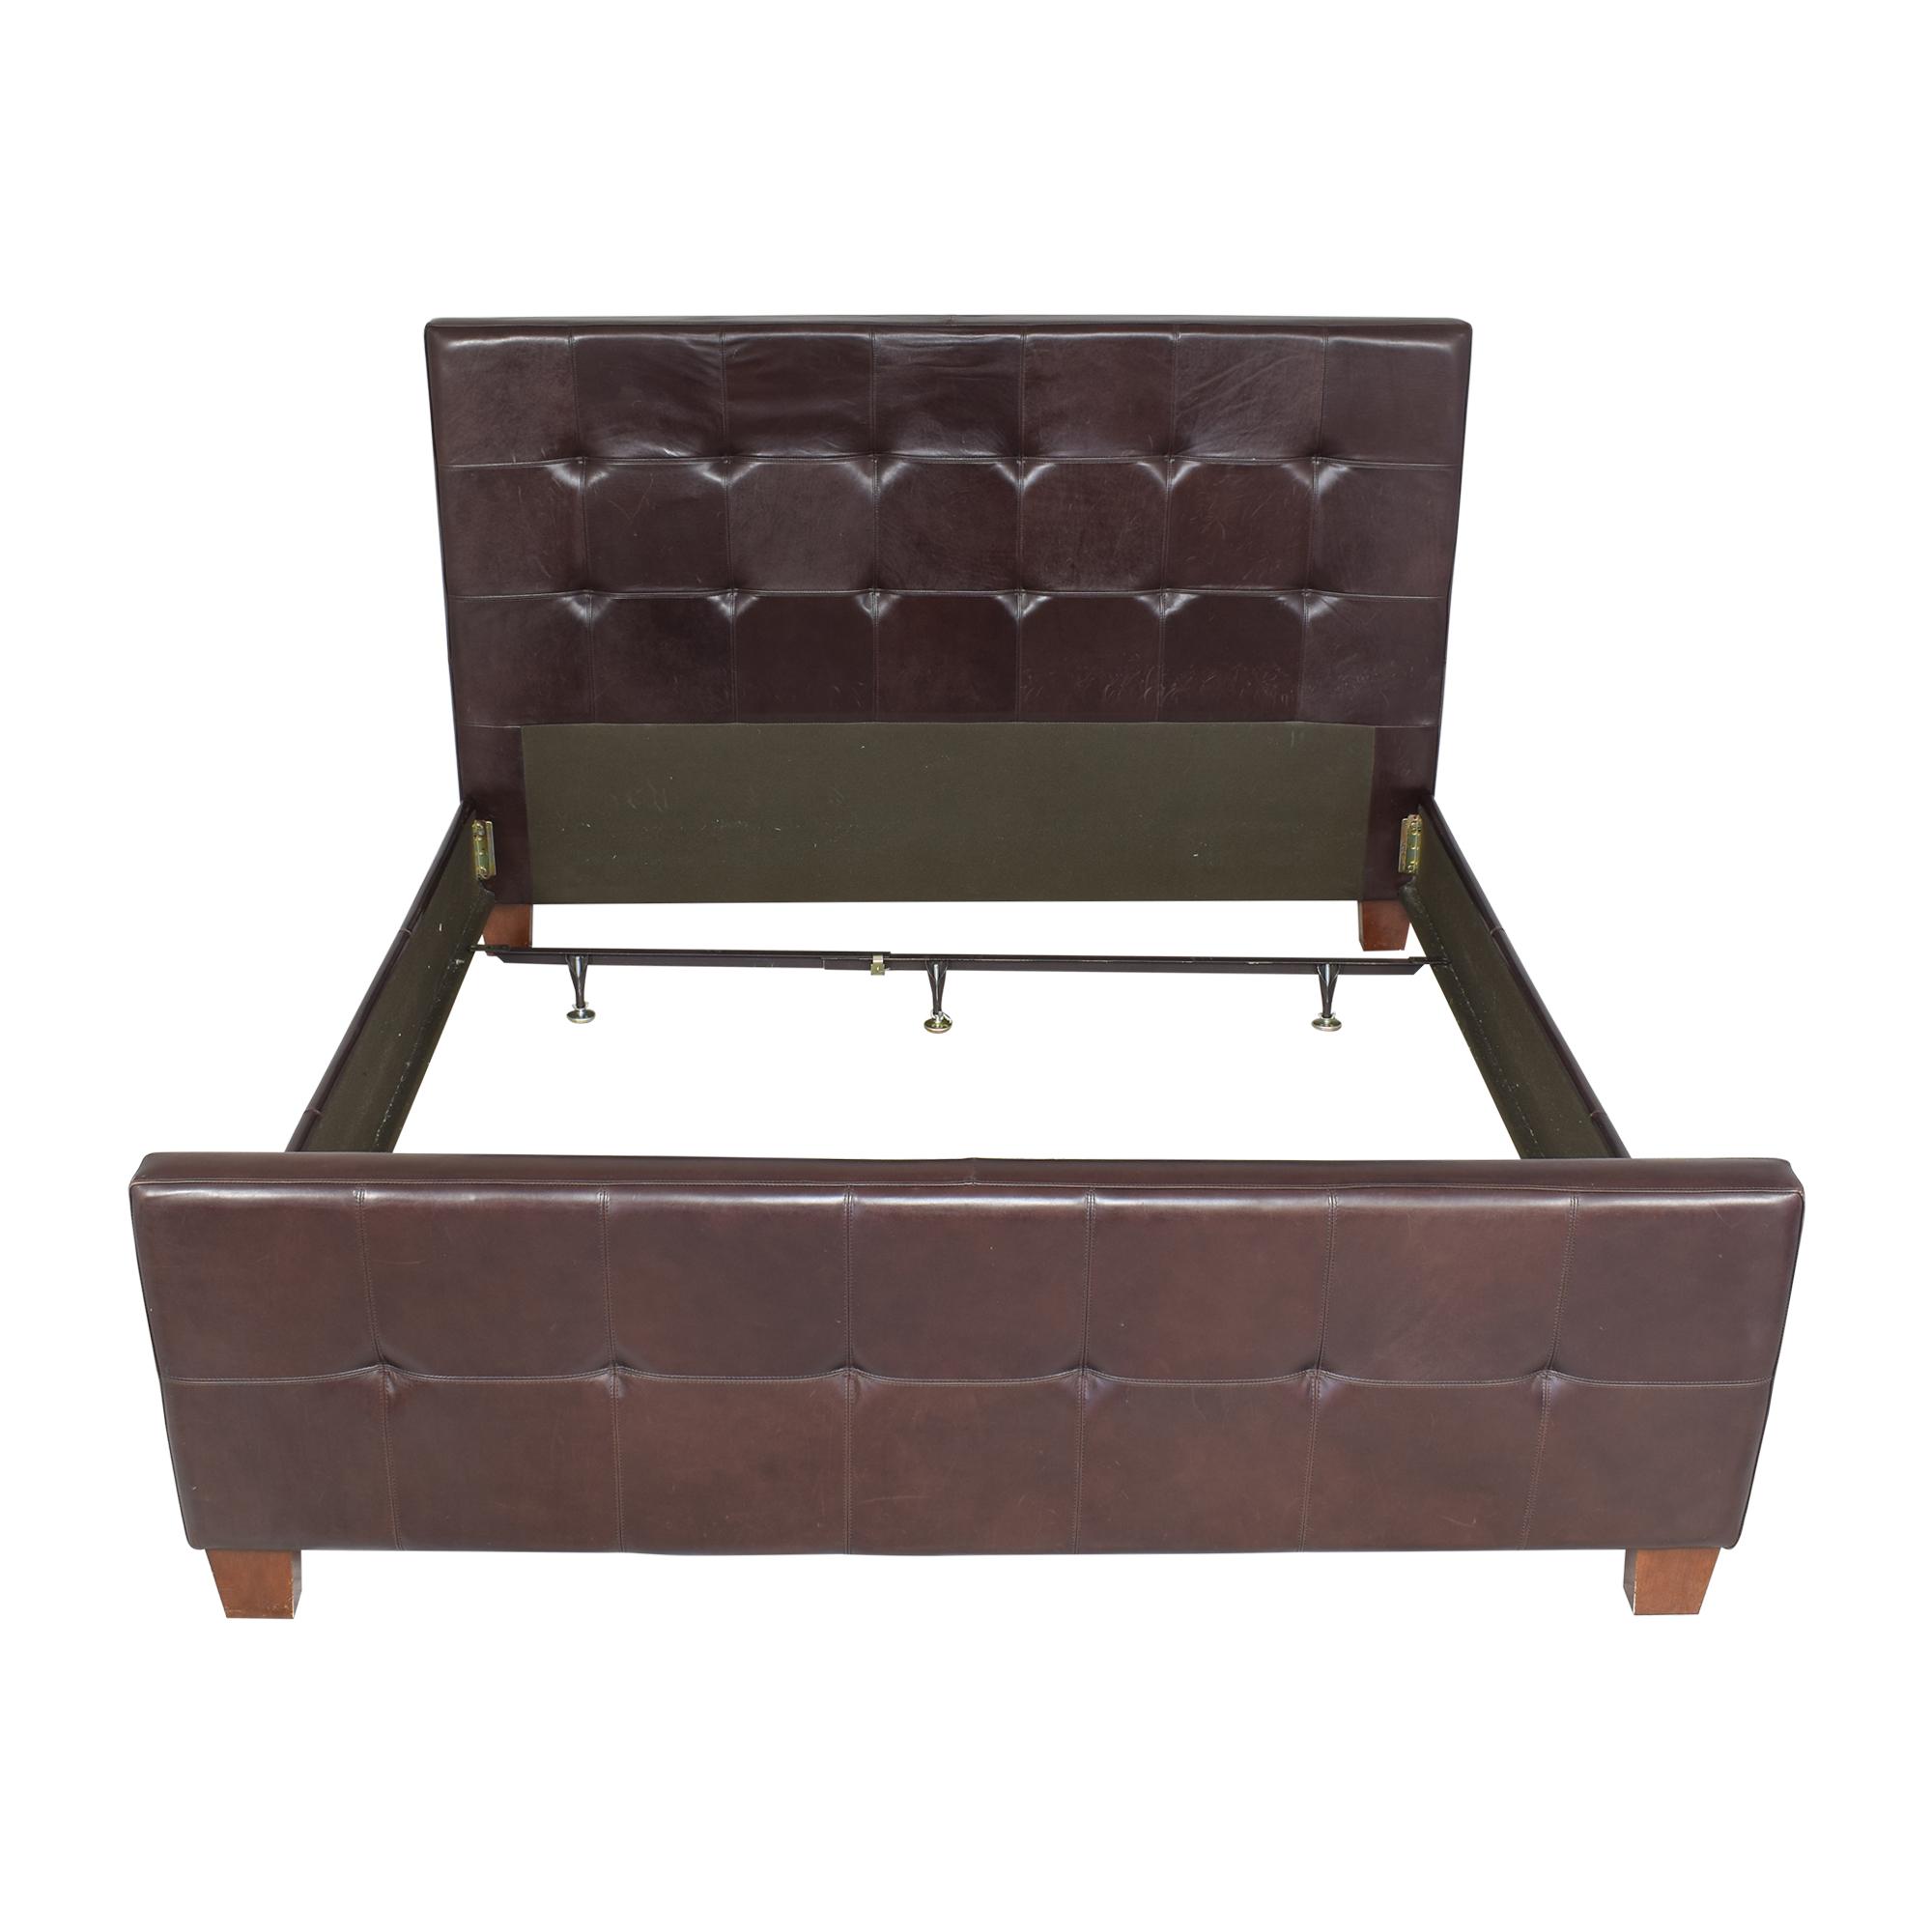 Crate & Barrel Tufted King Bed Crate & Barrel